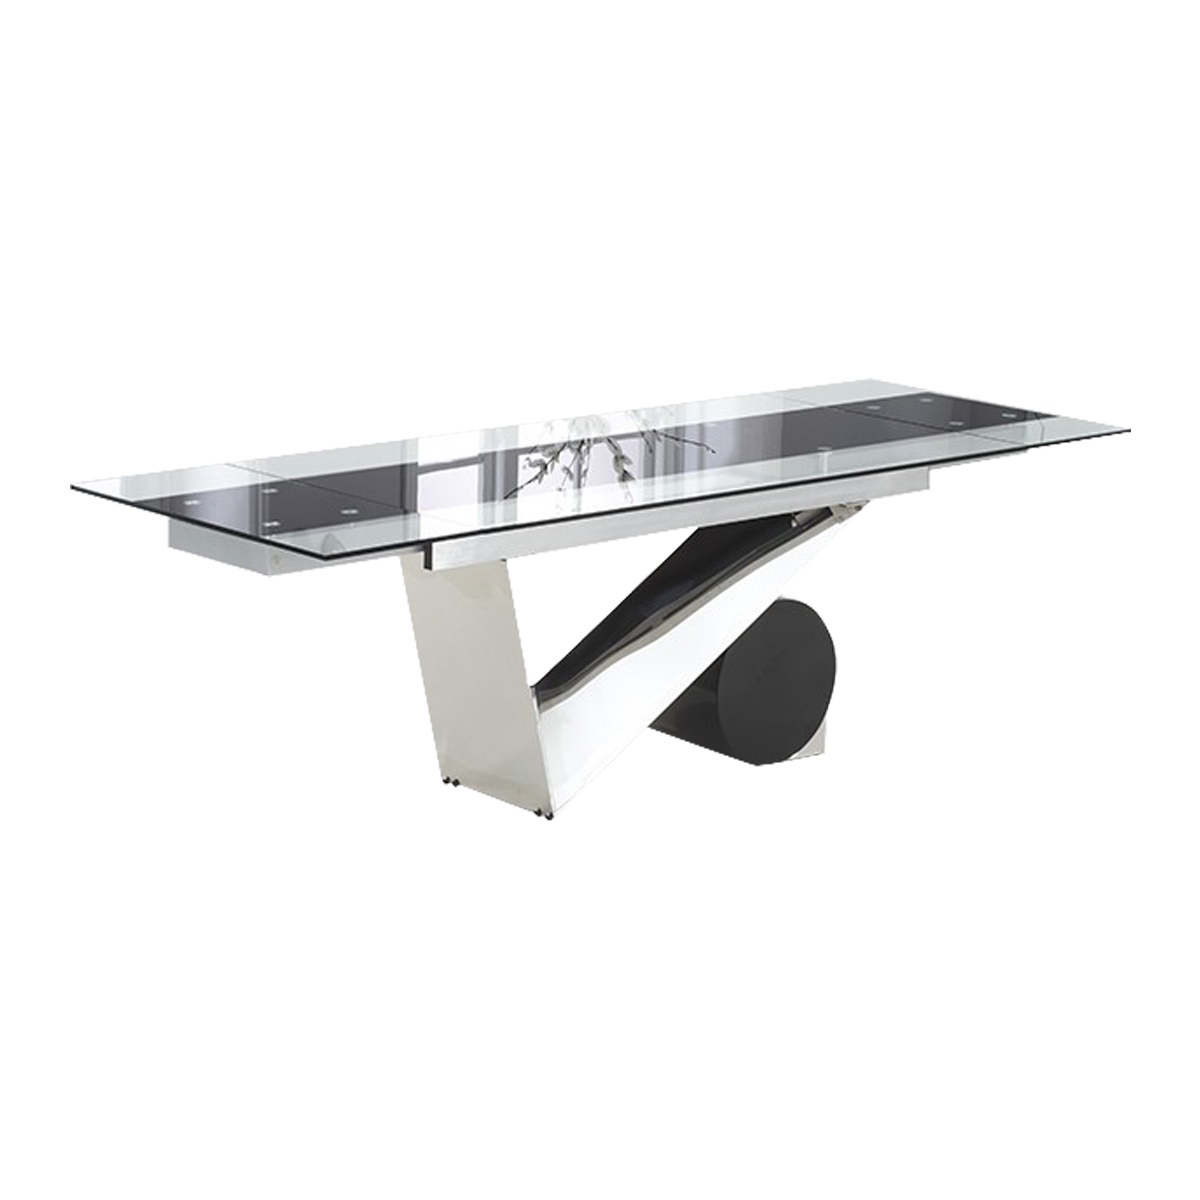 Garda Glass Extending Dining Table 8-12 Seater